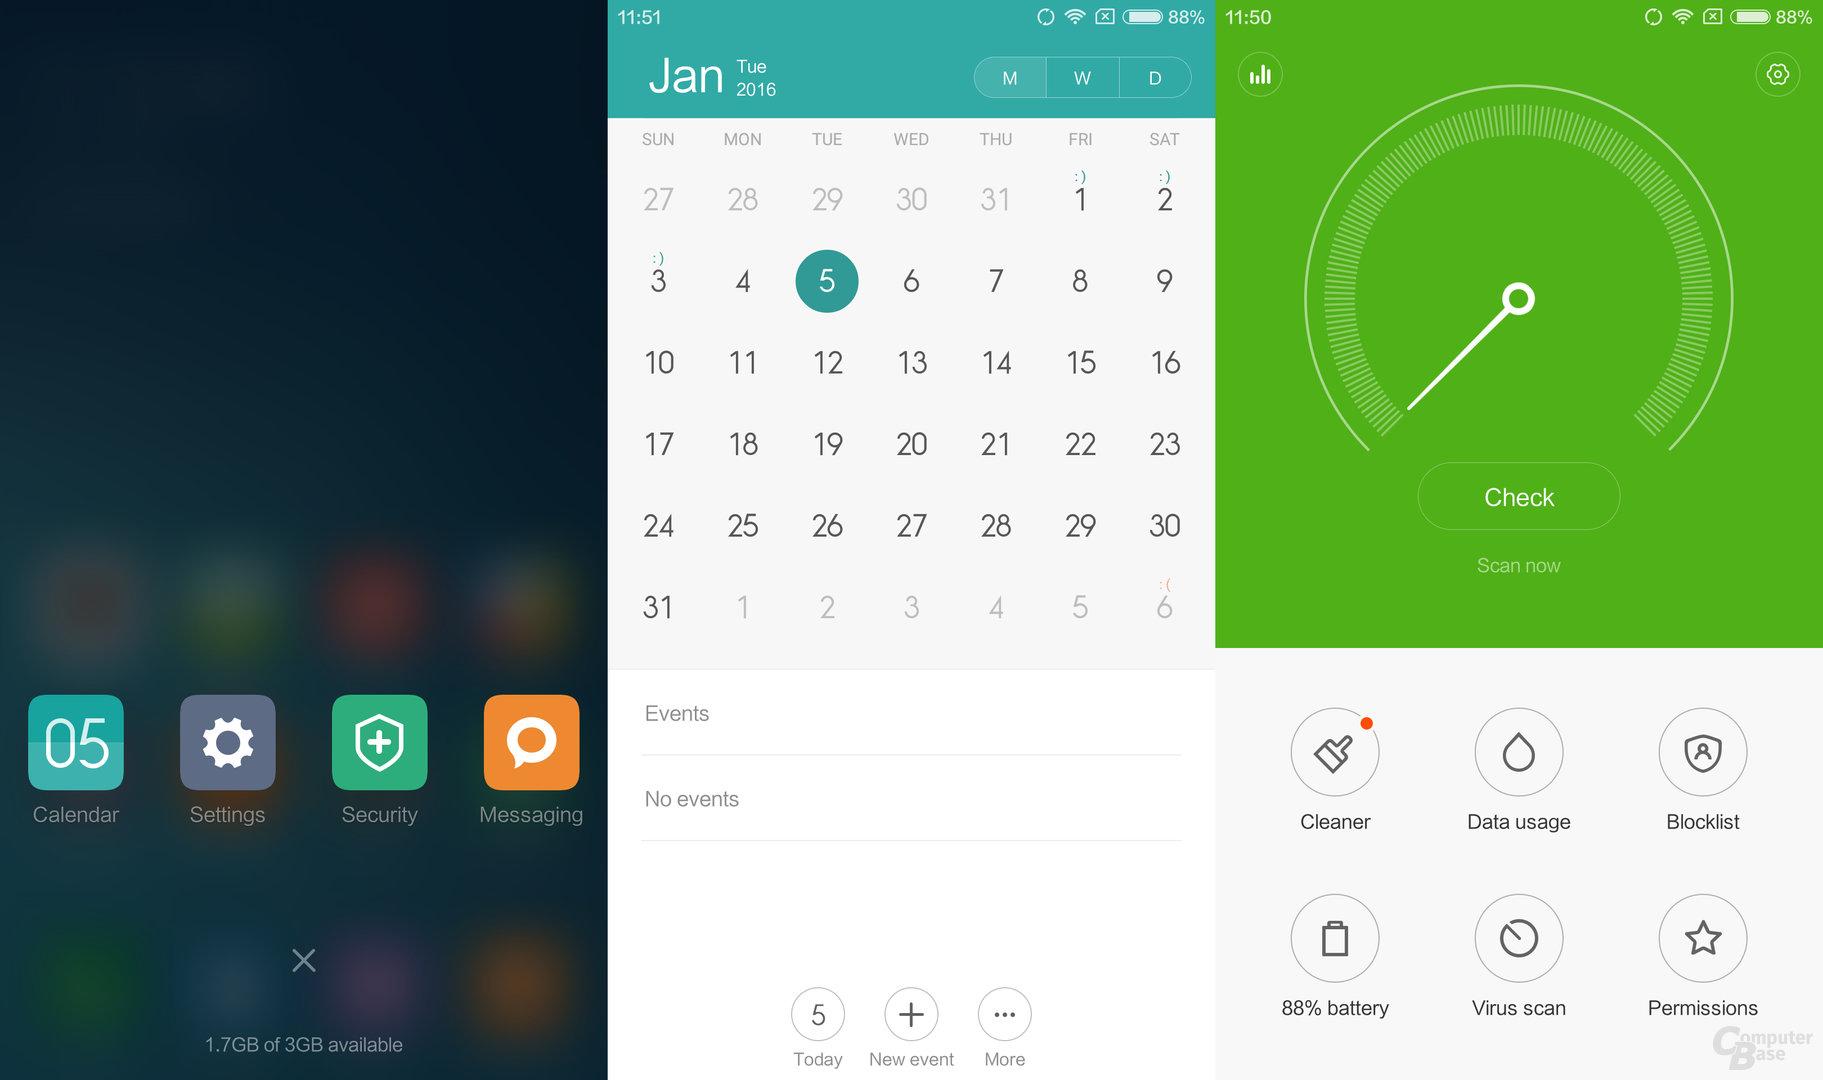 Geöffnete Apps|Kalender|Security